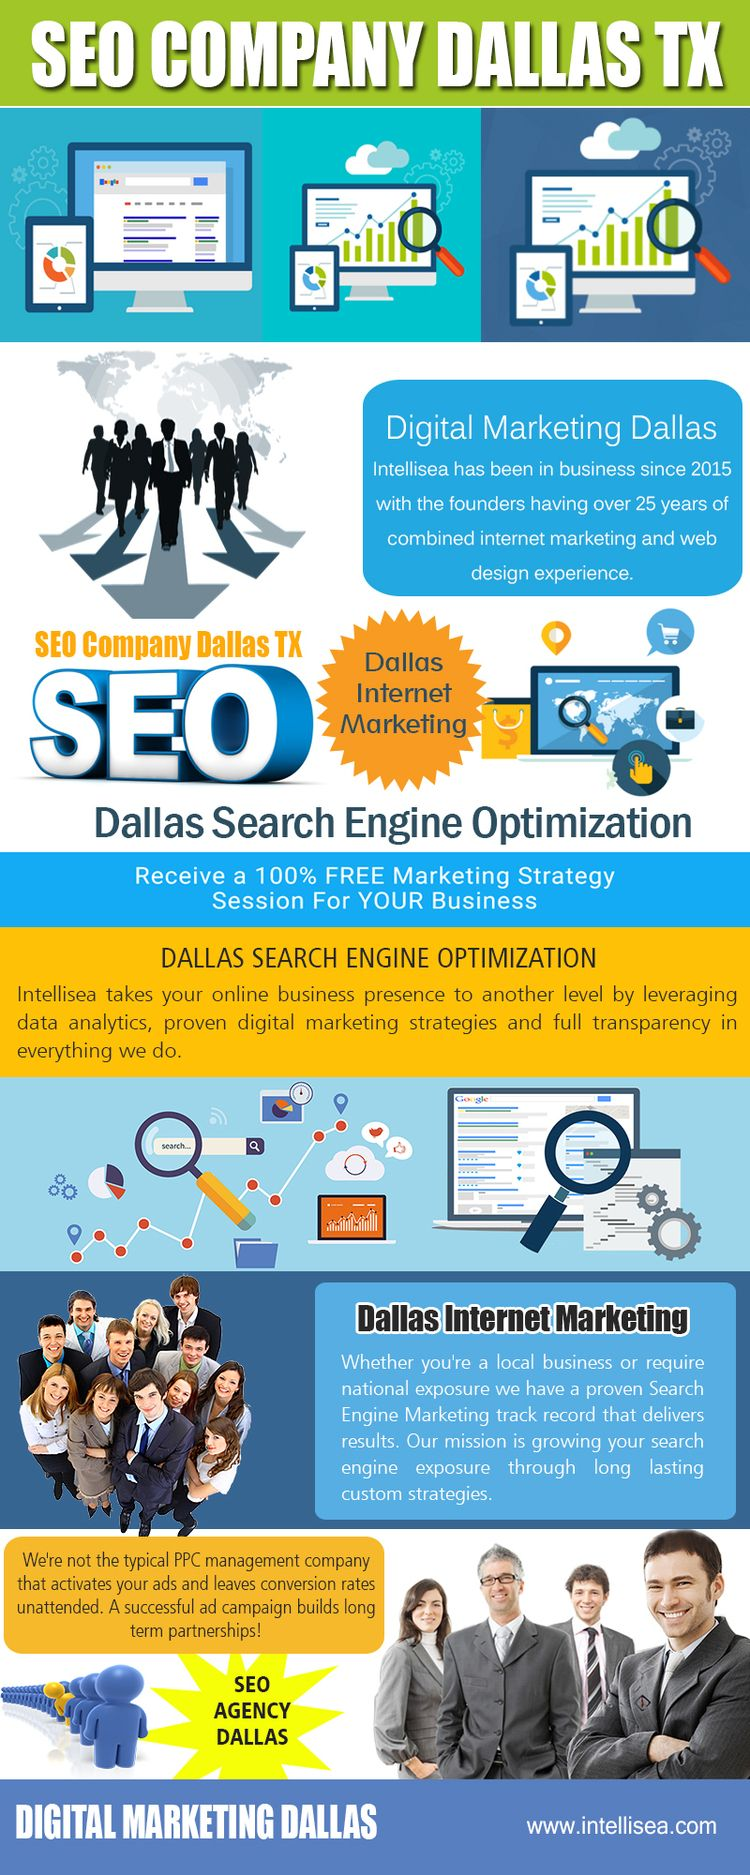 SEO Agency Dallas | intellisea - professionalseoservices | ello